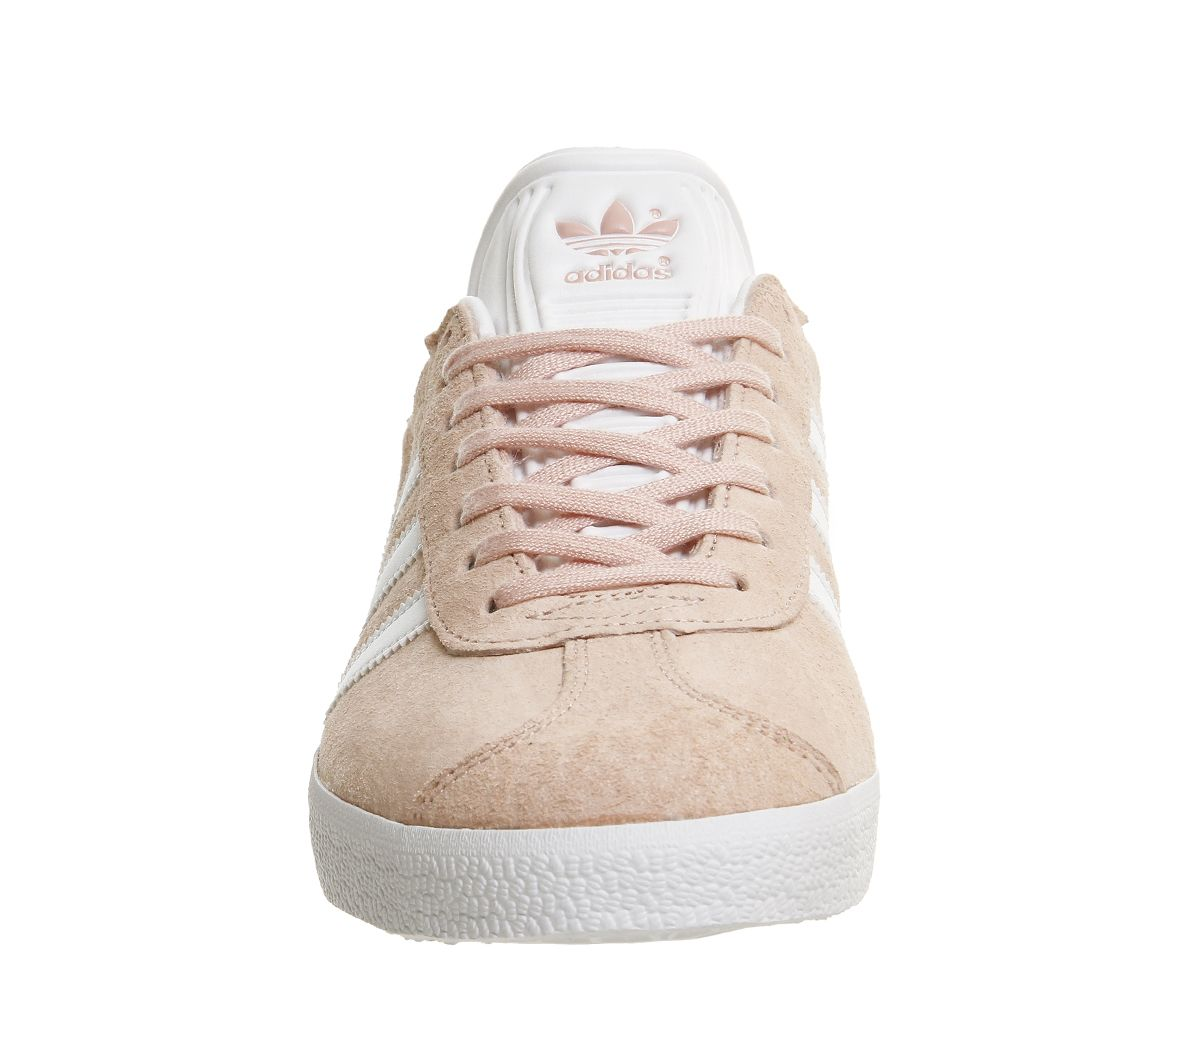 Adidas-Gazelle-Vapour-Pink-White-Trainers-Shoes thumbnail 6